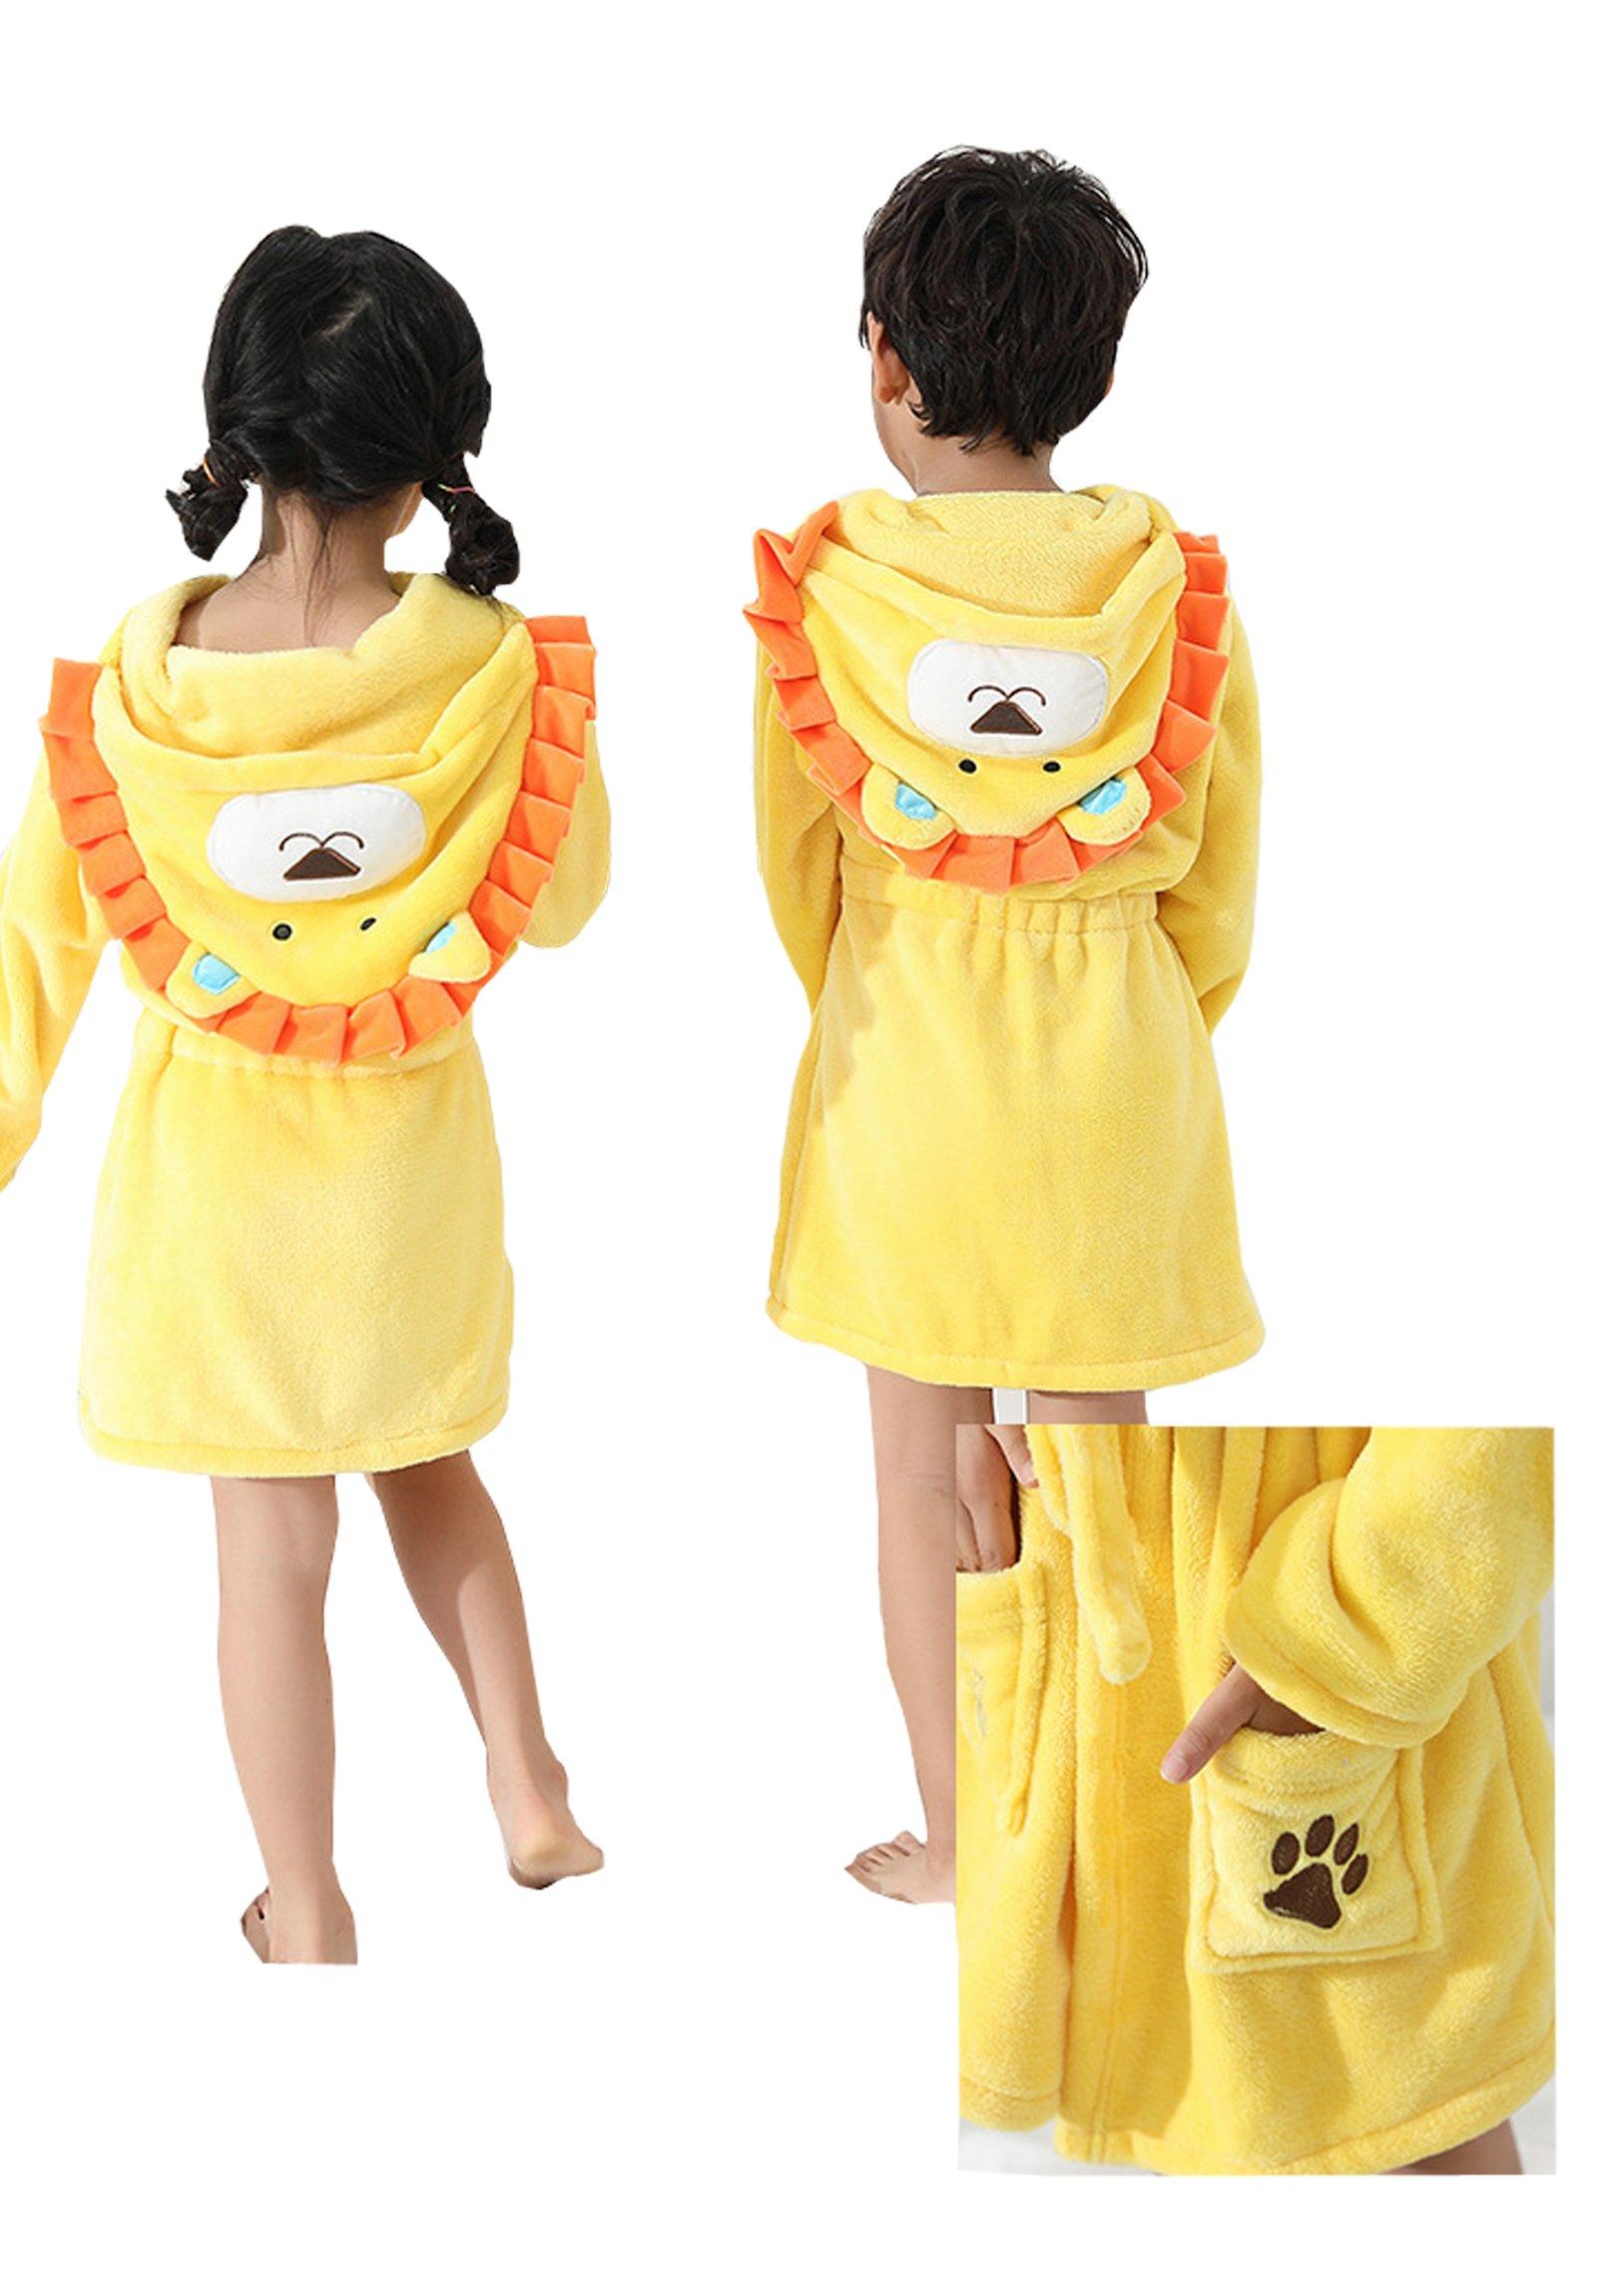 EPLAZA 3-6 Year Girl Boy Flannel Hooded Cute Animal Robe Sleepwear Kid Bathrobe Convertible Pillow (Tag 120, Yellow Lion) by EPLAZA (Image #5)